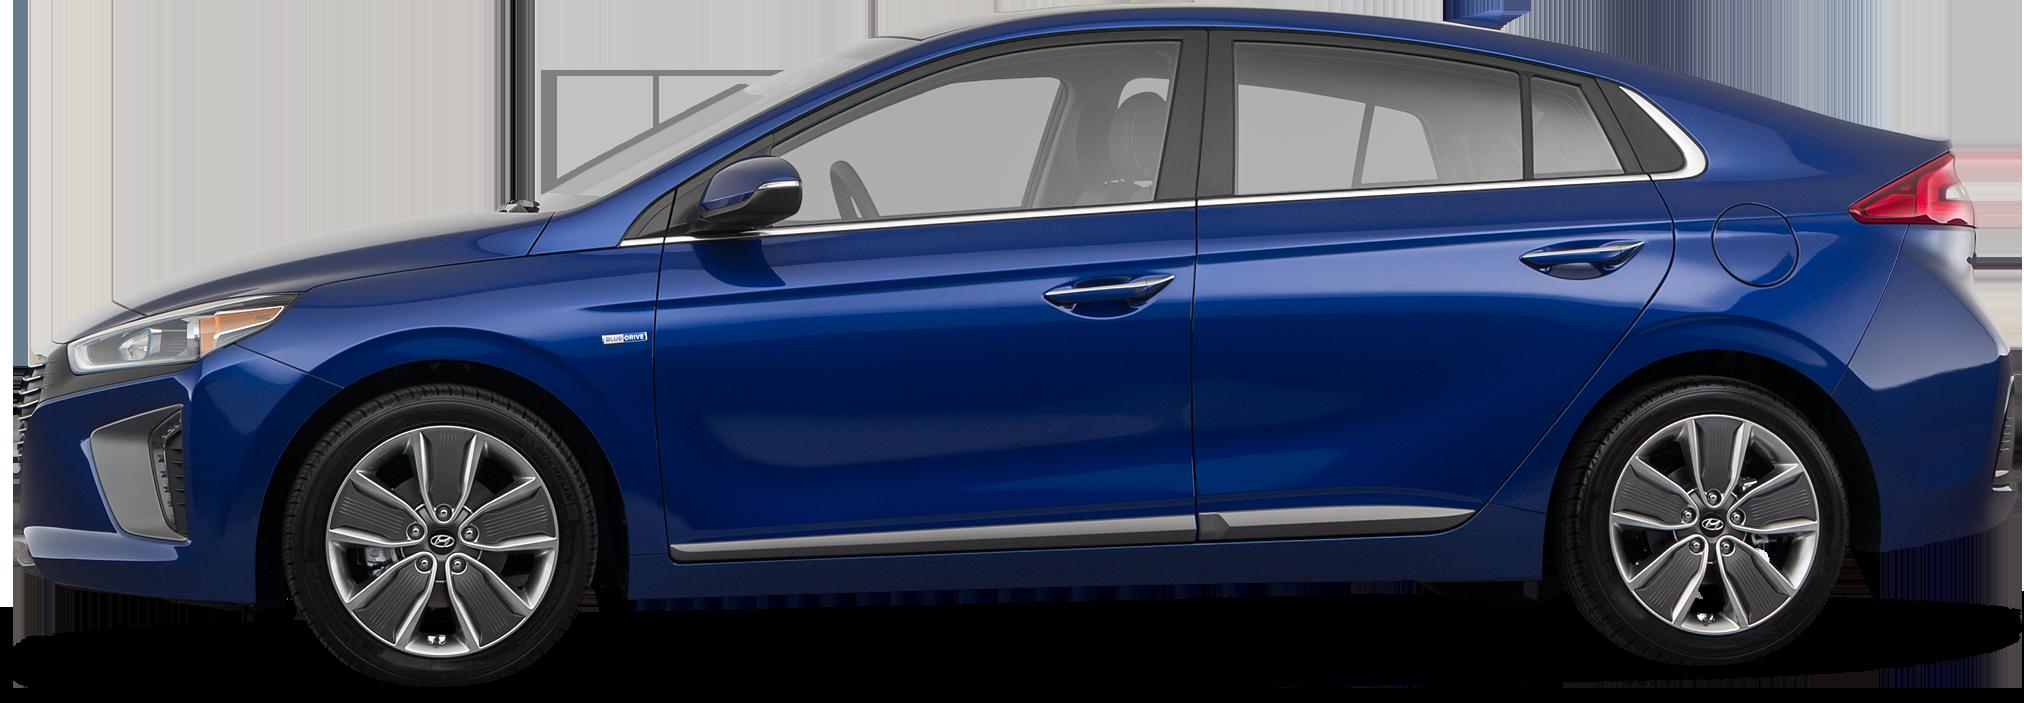 2019 Hyundai Ioniq Hybrid Hatchback Limited